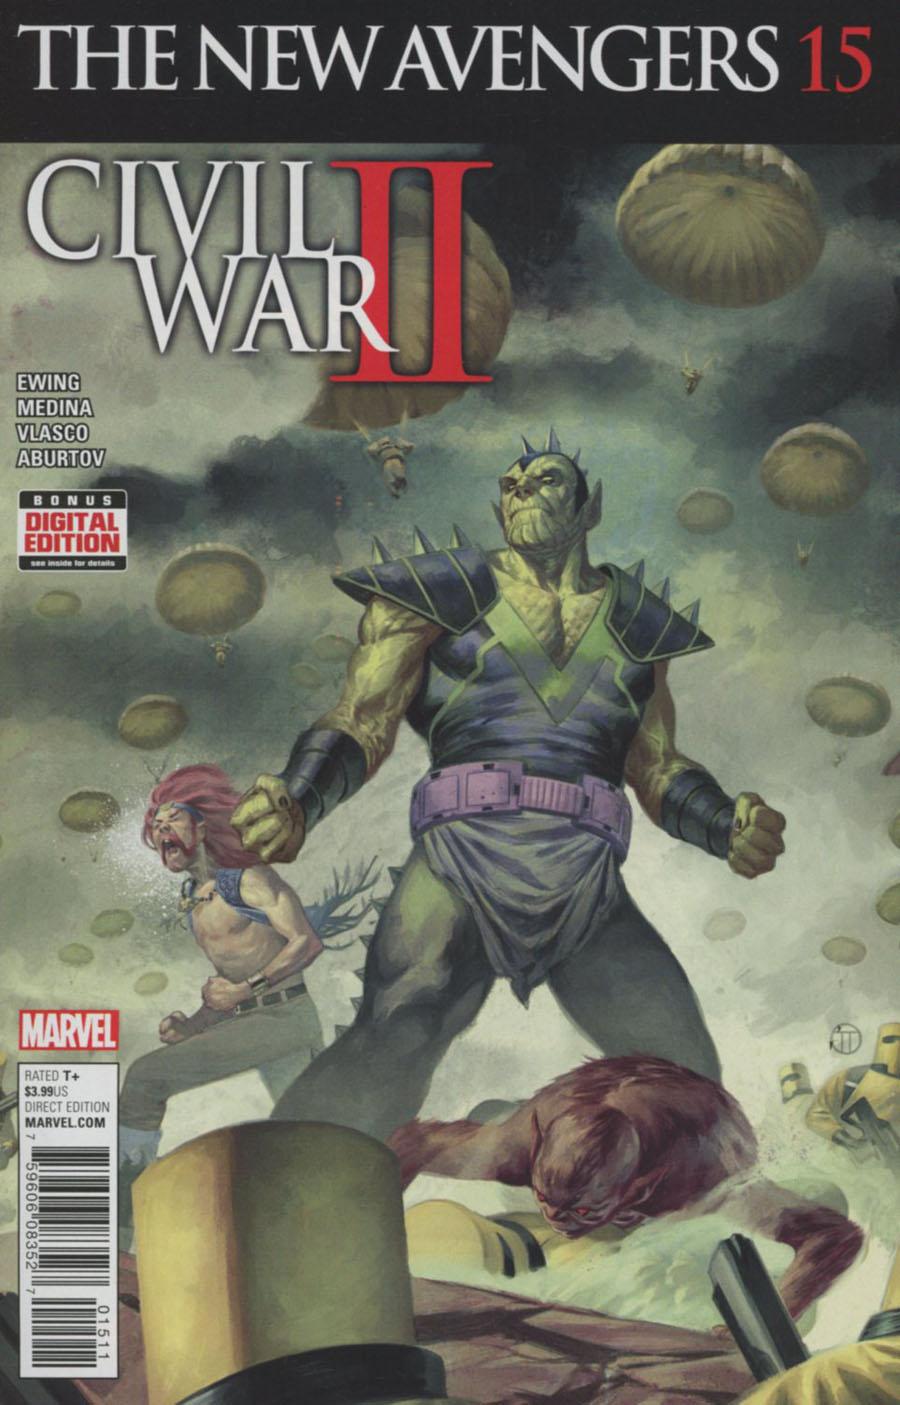 New Avengers Vol 4 #15 (Civil War II Tie-In)